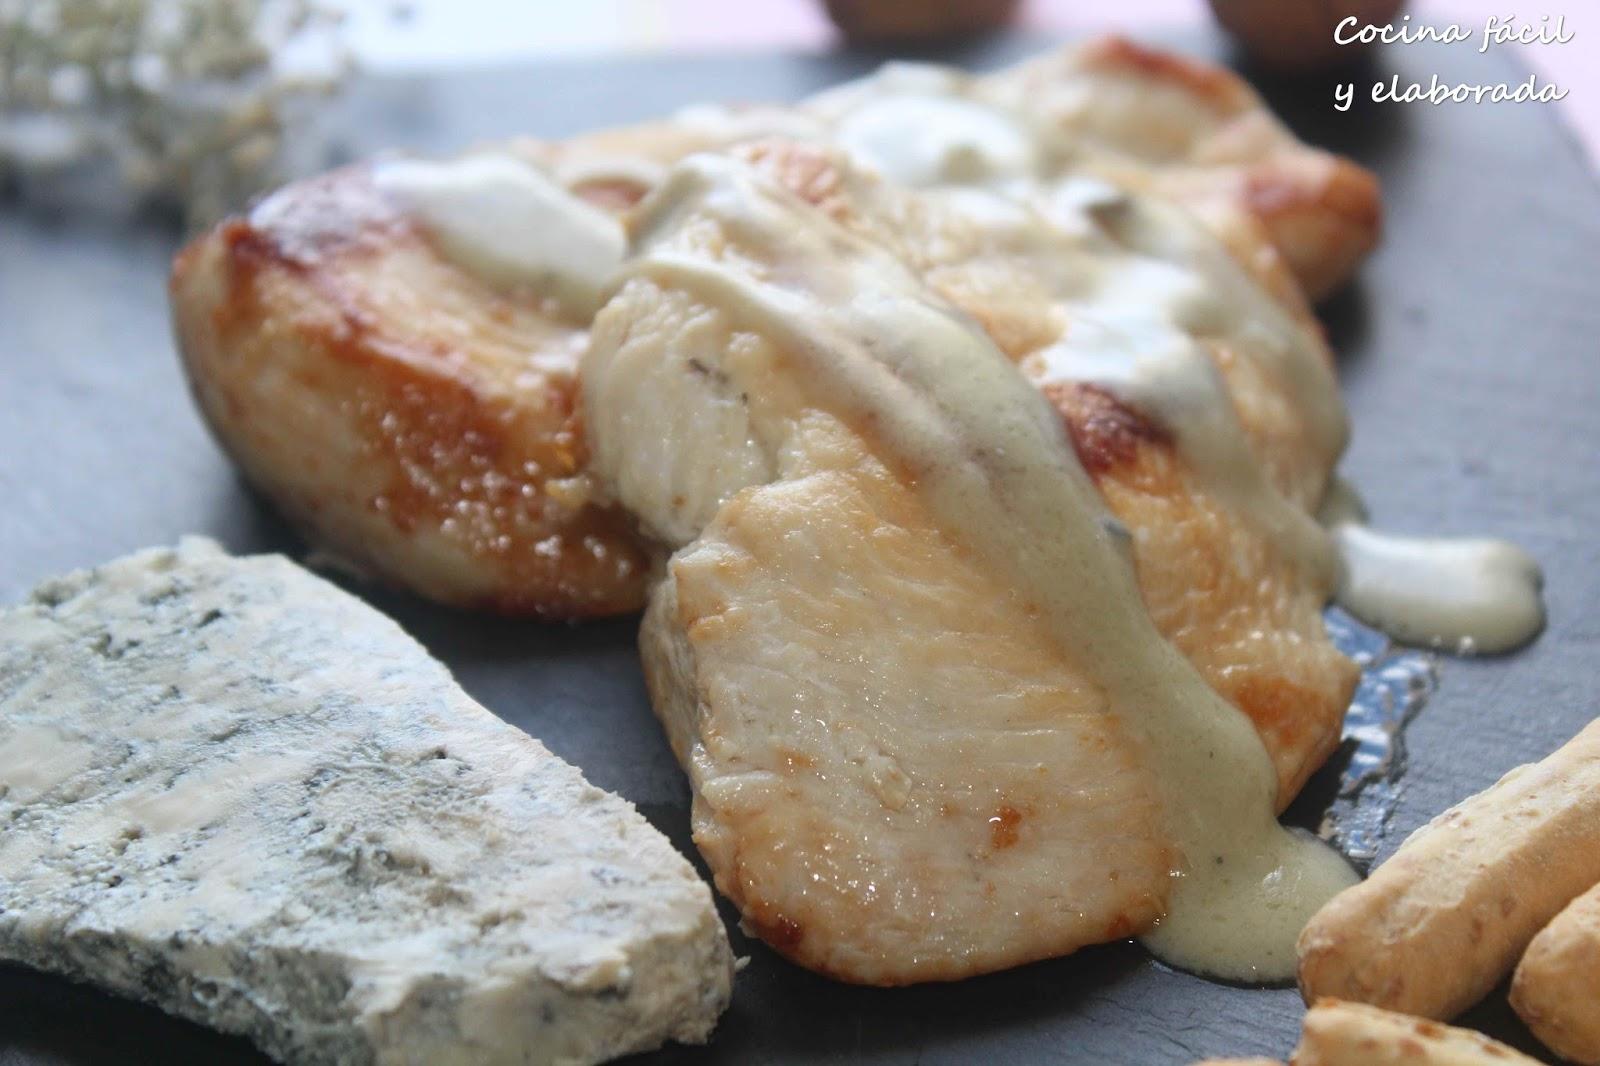 Cocina facil y elaborada pechuga de pollo en salsa de - Pechuga d pollo en salsa ...